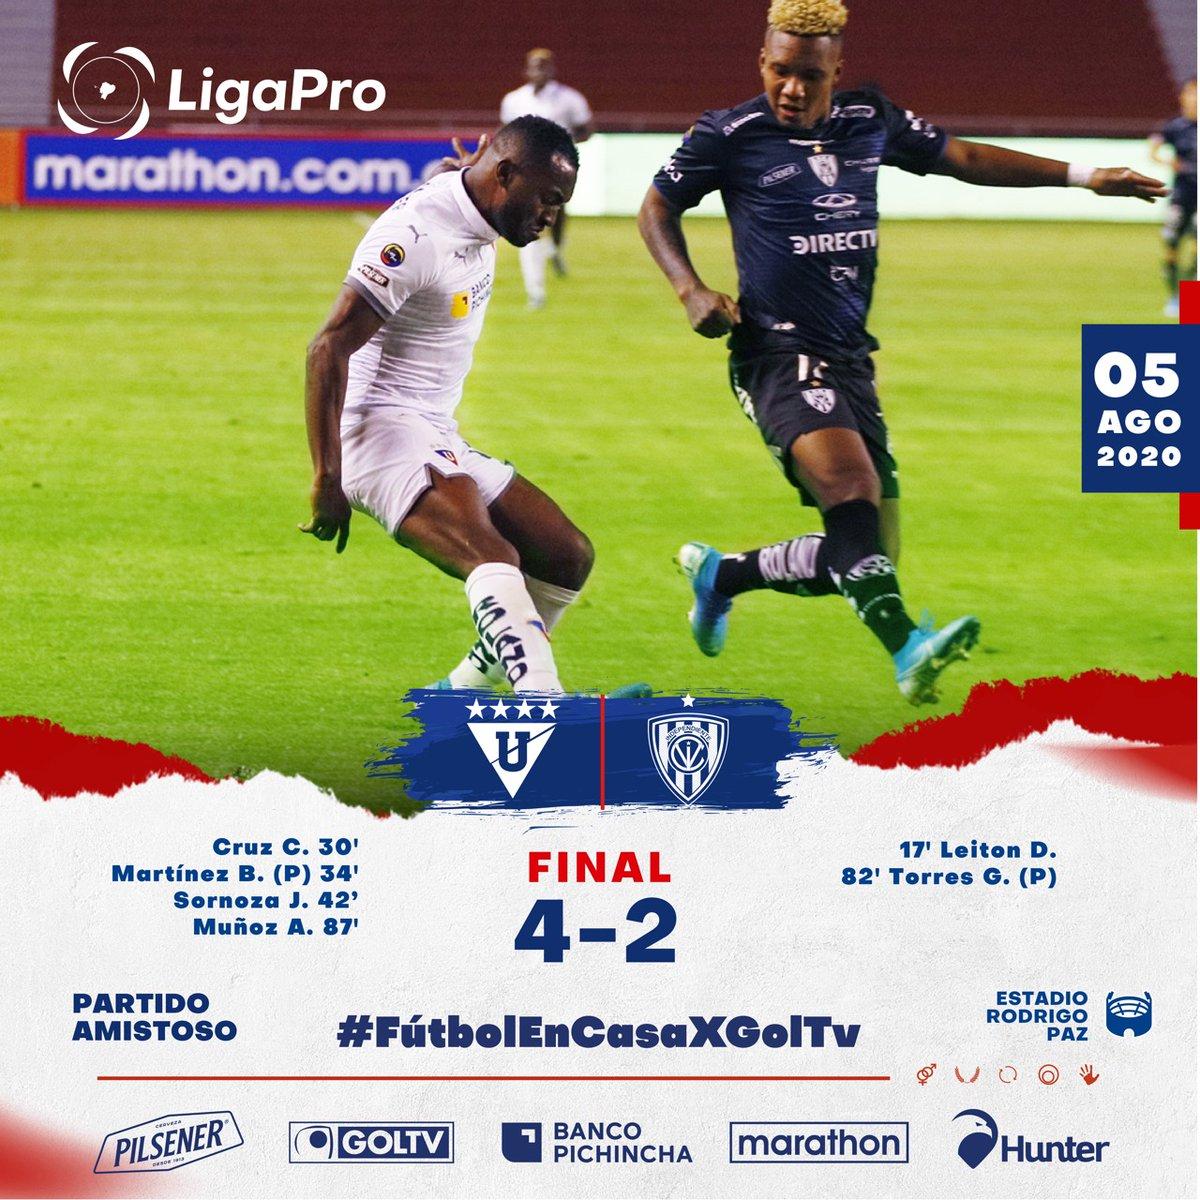 ¡Marcador Final!  #LigaPro   Amistoso ⠀   Estadio Rodrigo Paz Delgado ⠀ #LDU #IDV (-)⠀  Goles: #LDU: Cruz (30'), Martínez (34') -P, Sornoza (42'), Muñoz (87') #IDV: Leiton (17'), Torres (81') - P ⠀  #LigaPro  #GanamosTodos #LDU #IDVpic.twitter.com/vnklKfp0Ty